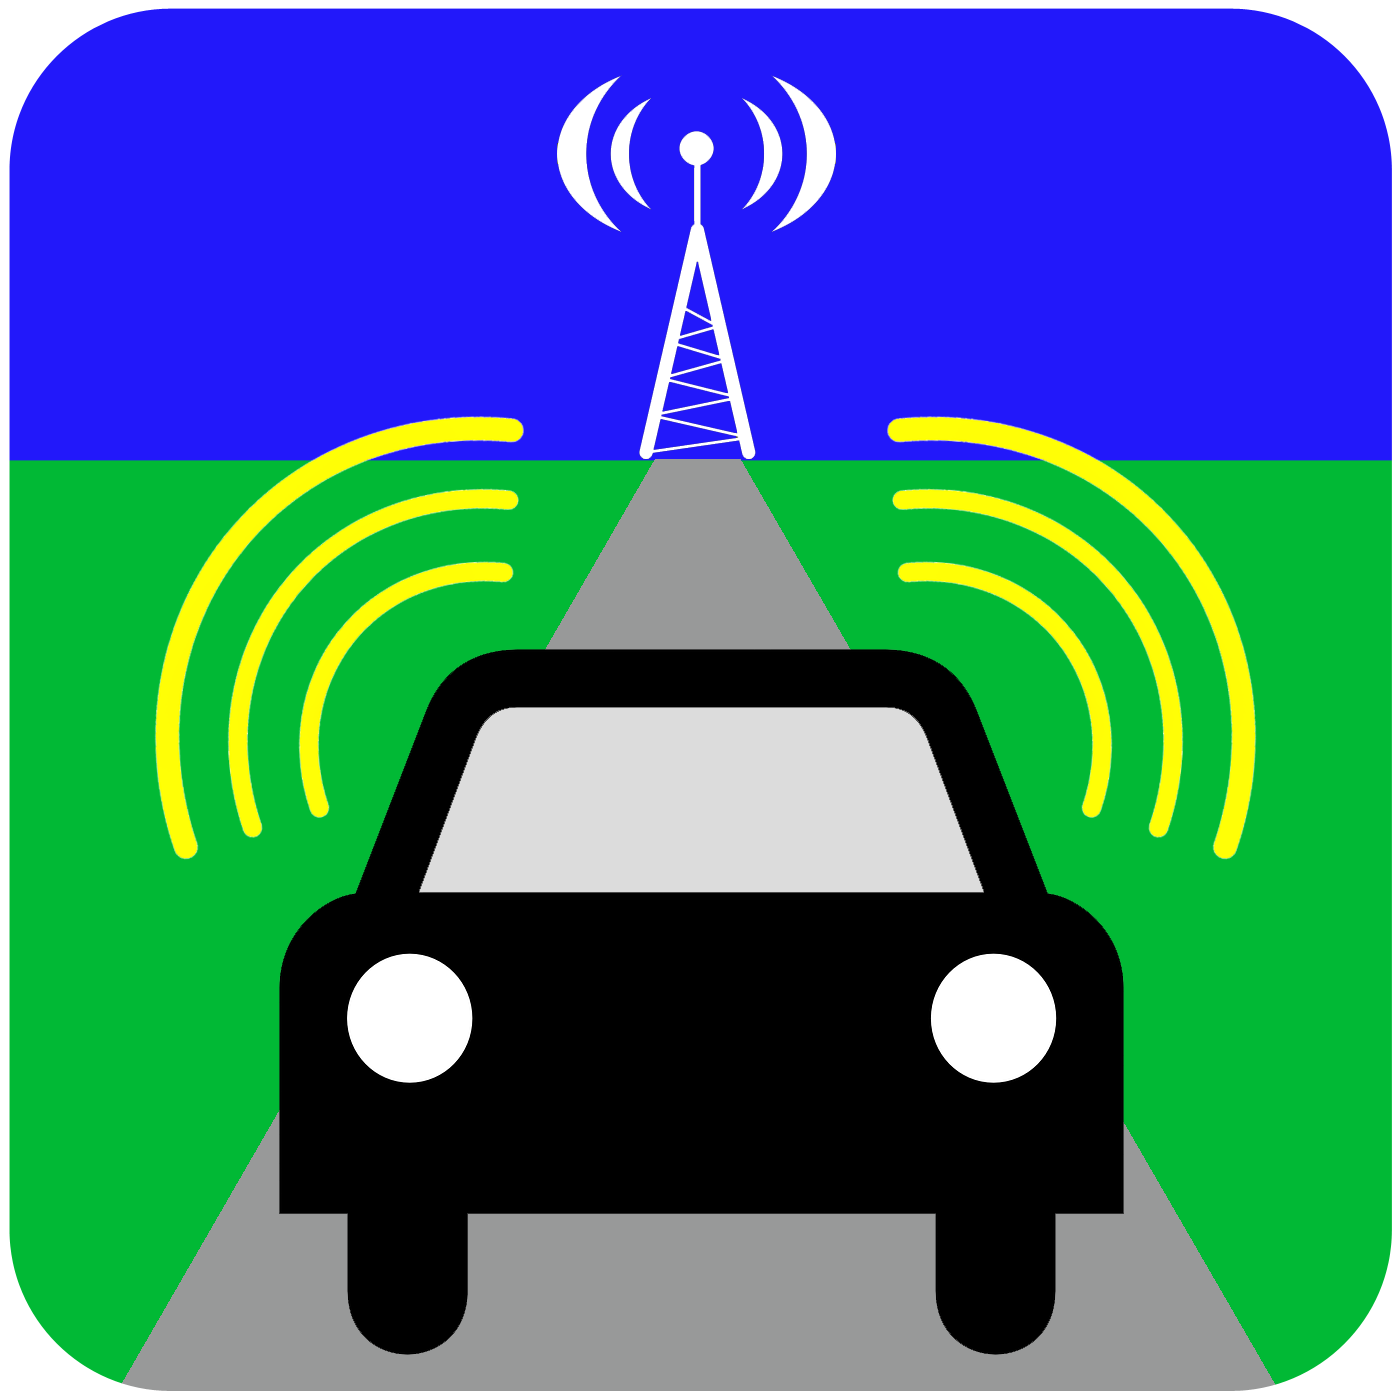 Droid Maxx 2 additionally Telecharger Gratuitement 3d Fireworks Screensaver 2015 besides La Aplicacion De Radio Definitiva Para Chromecast as well Home Audio Setup together with Details. on slacker radio android